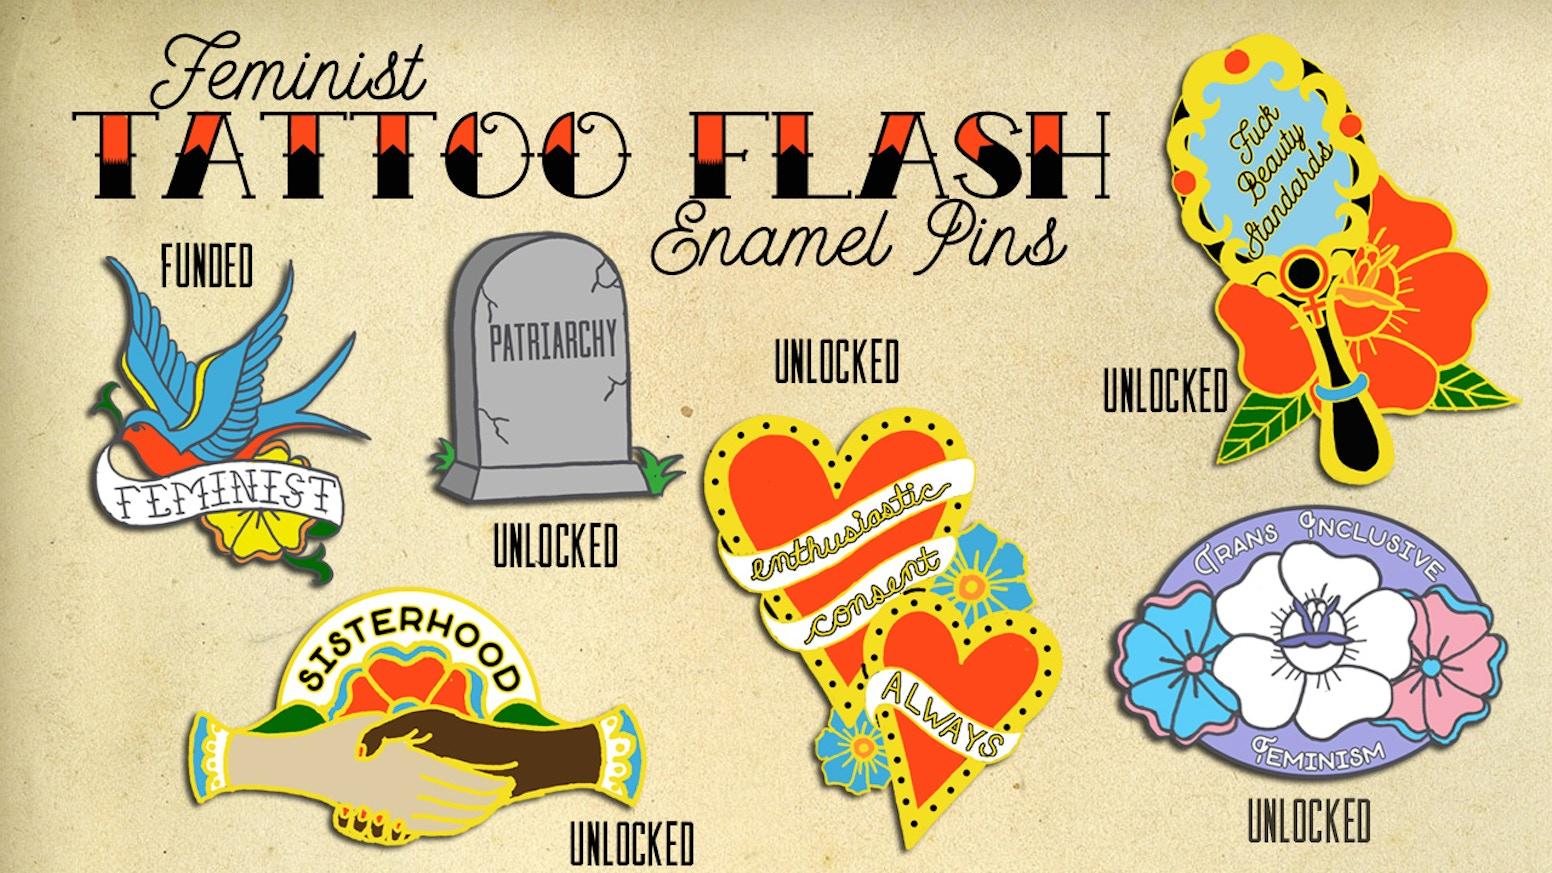 Feminist Tattoo Flash Enamel Pins By Angi Becker First Stretch